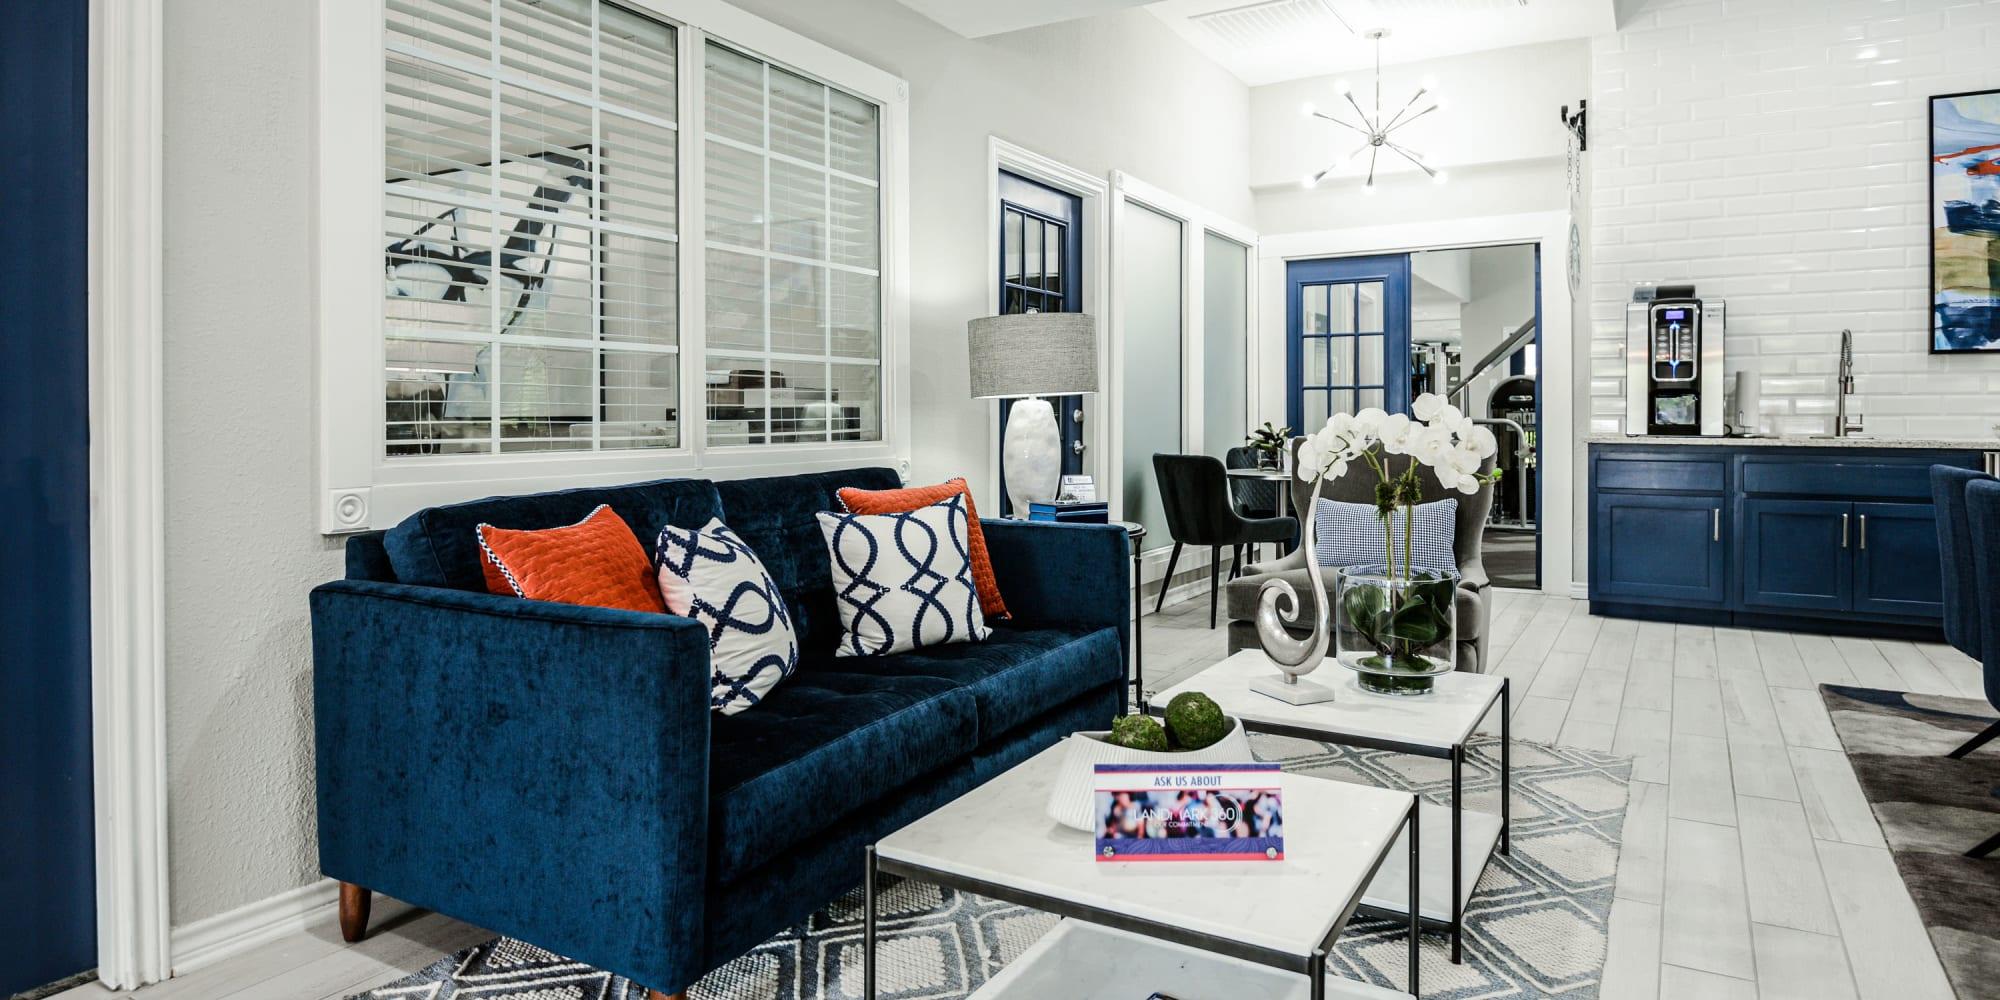 The Regent Apartments in Dallas, Texas